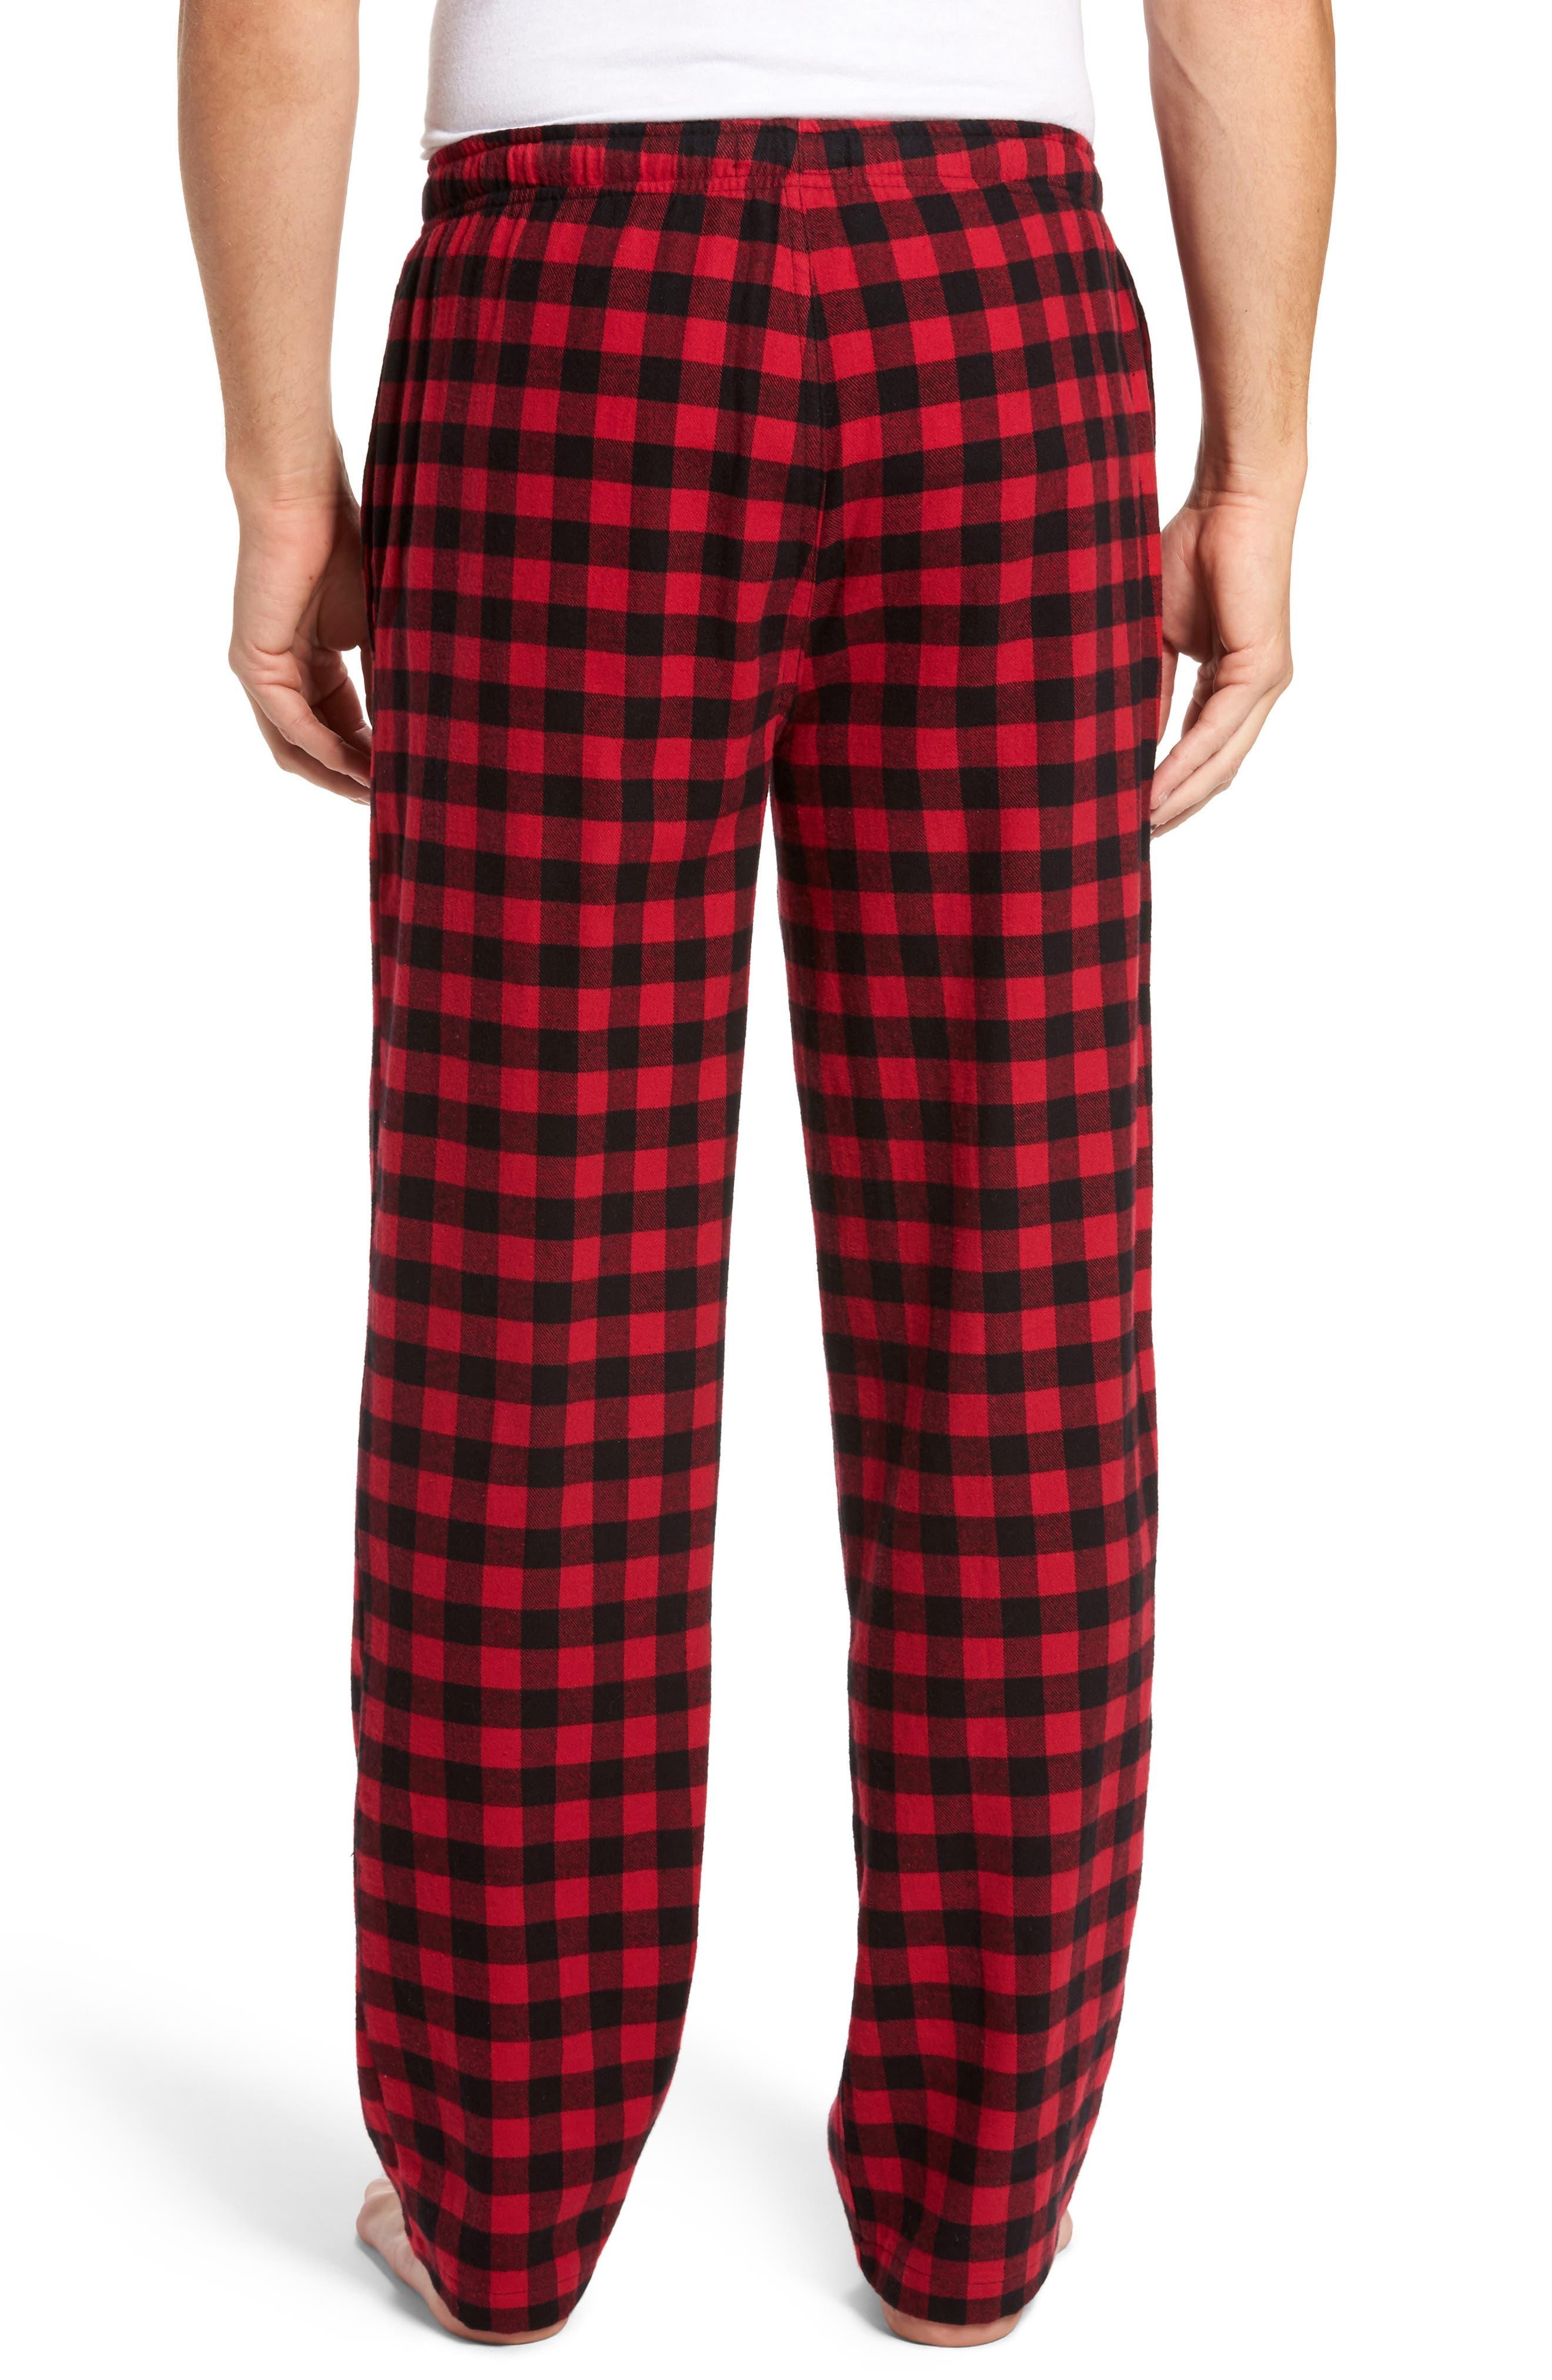 Flannel Pajama Pants,                             Alternate thumbnail 2, color,                             RED CHILI- BLACK BUFFALO